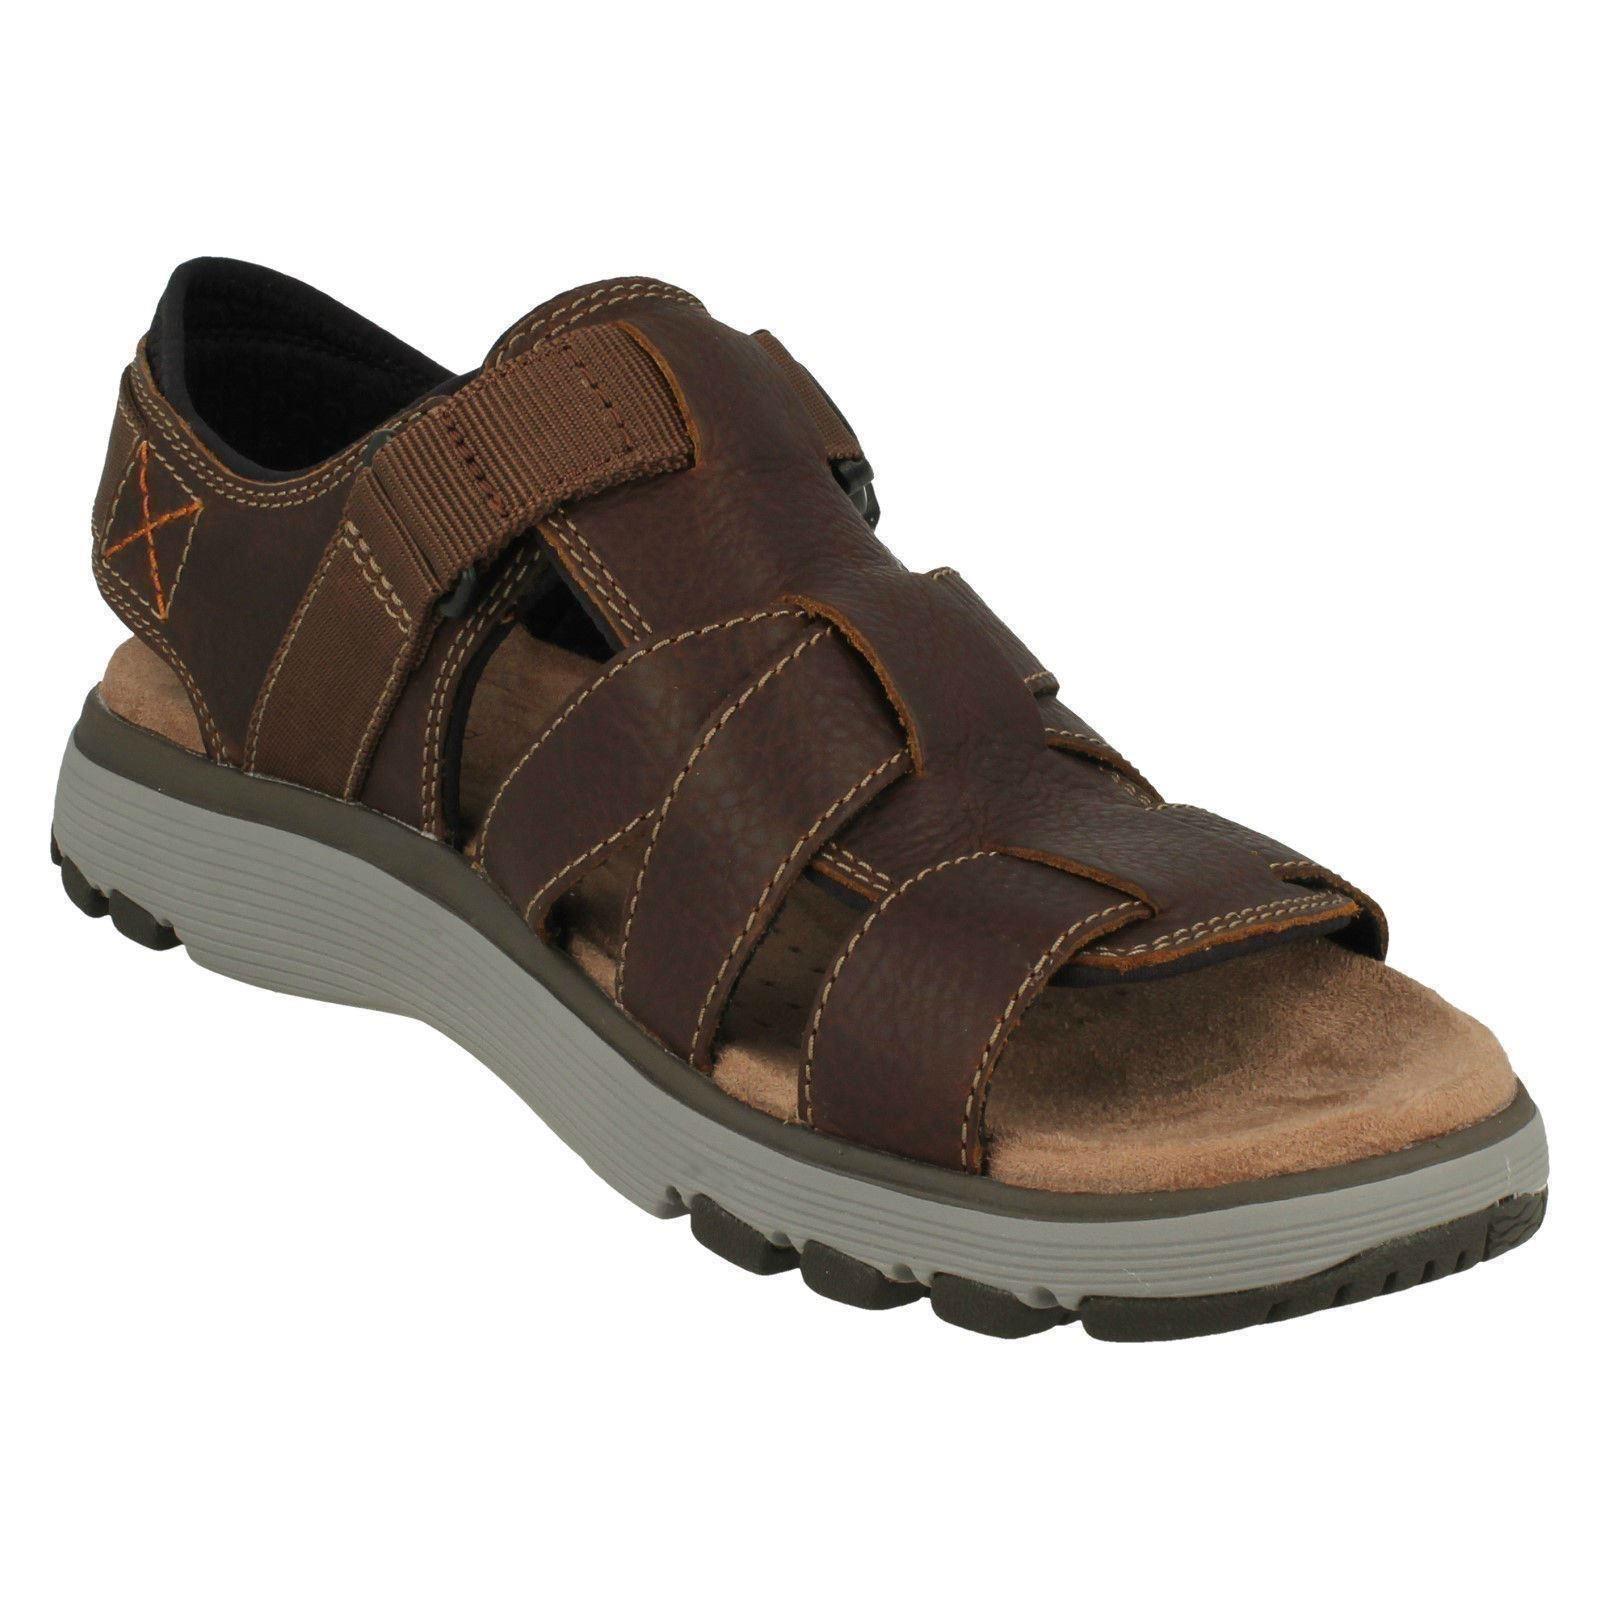 5bd6af75c8a2 Mens Clarks Casual Strapped Sandals - Un Trek Cove